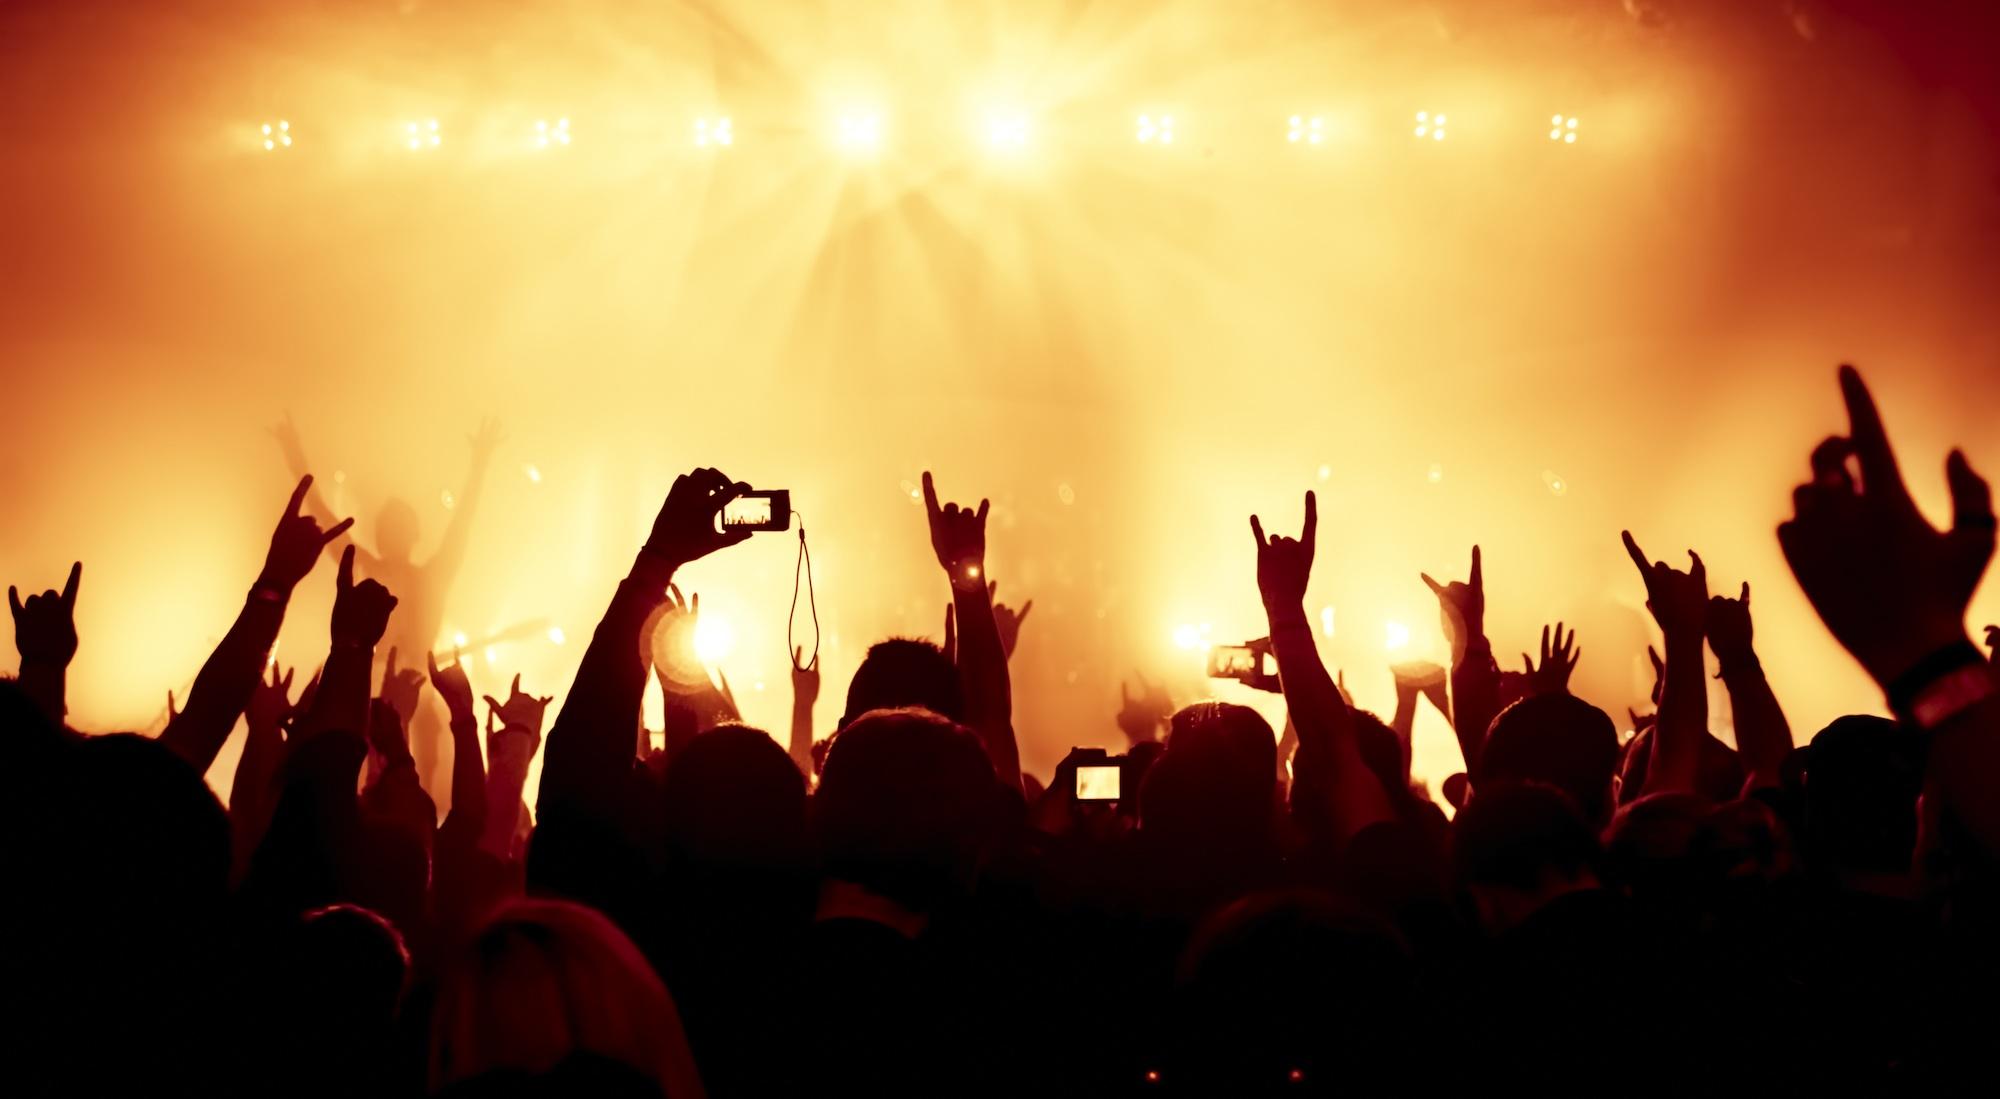 concert audience